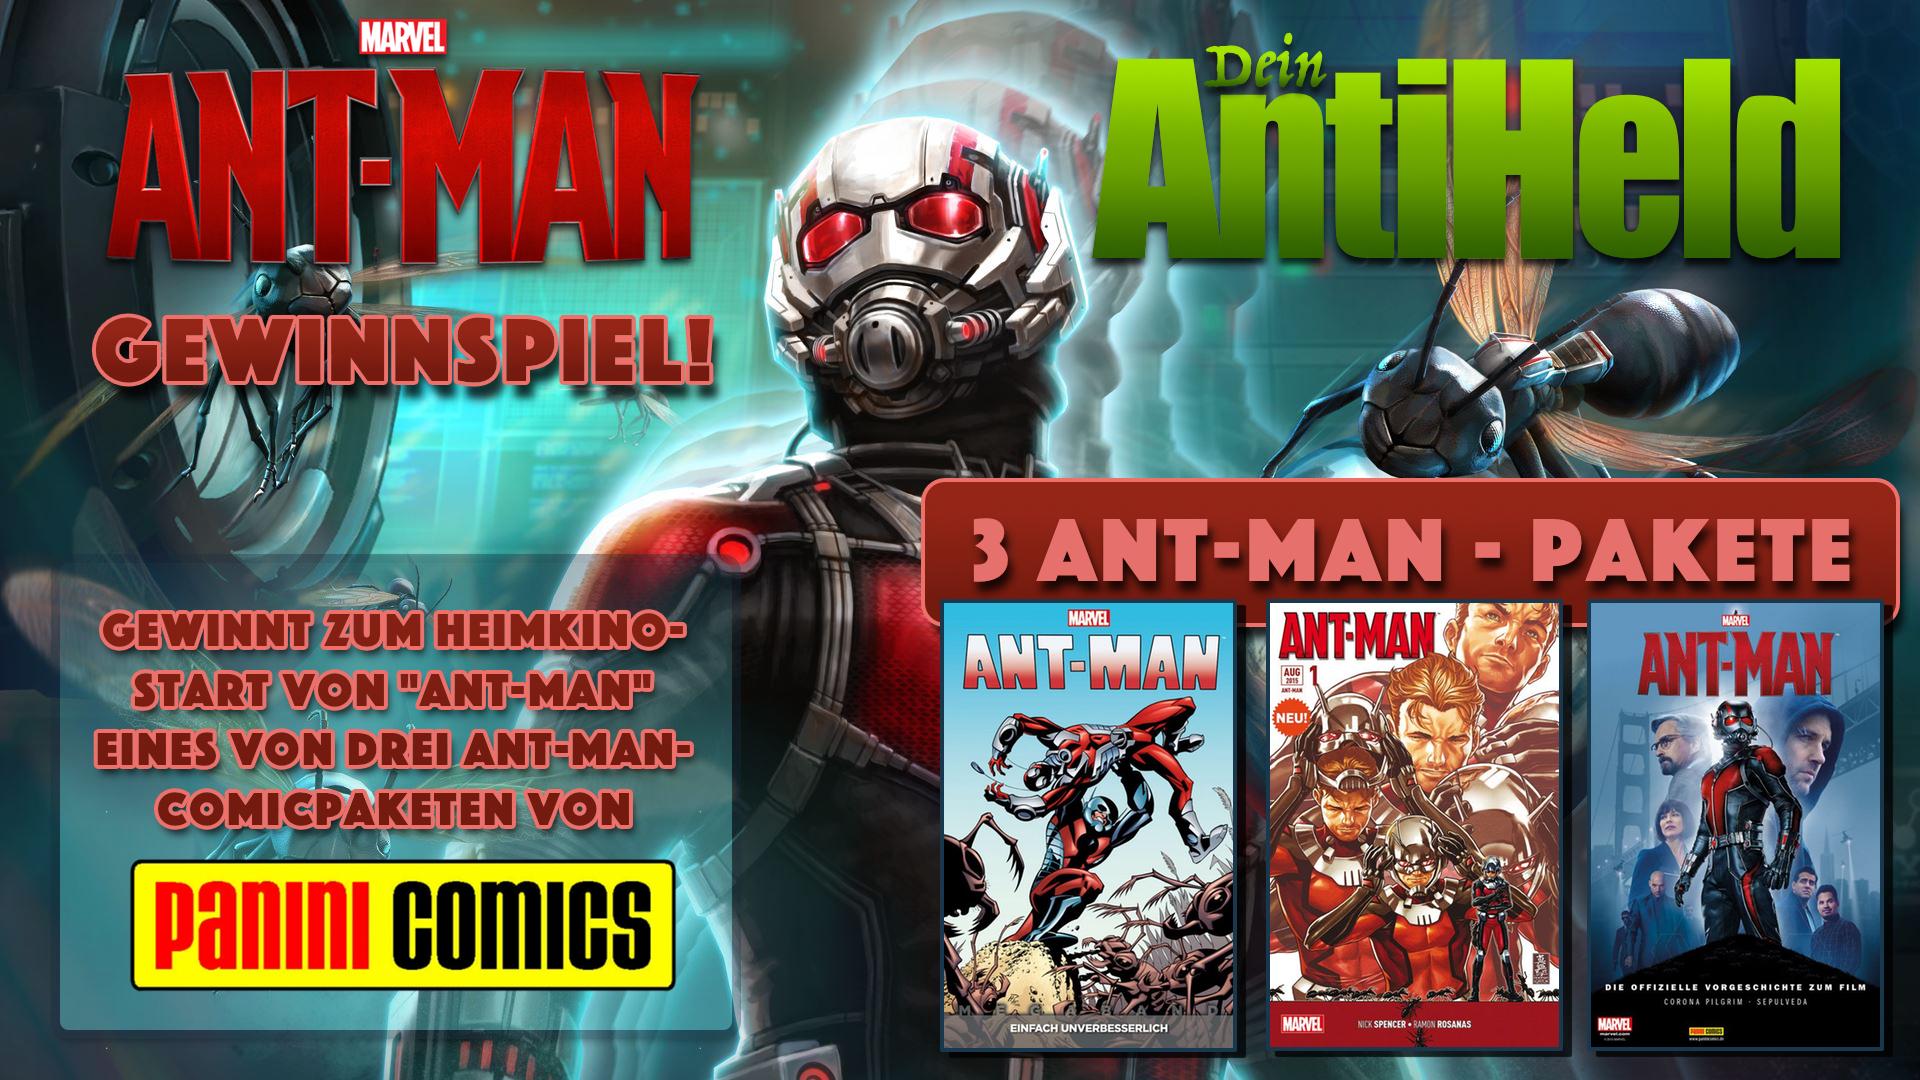 Ant-Man Gewinnspiel Flyer